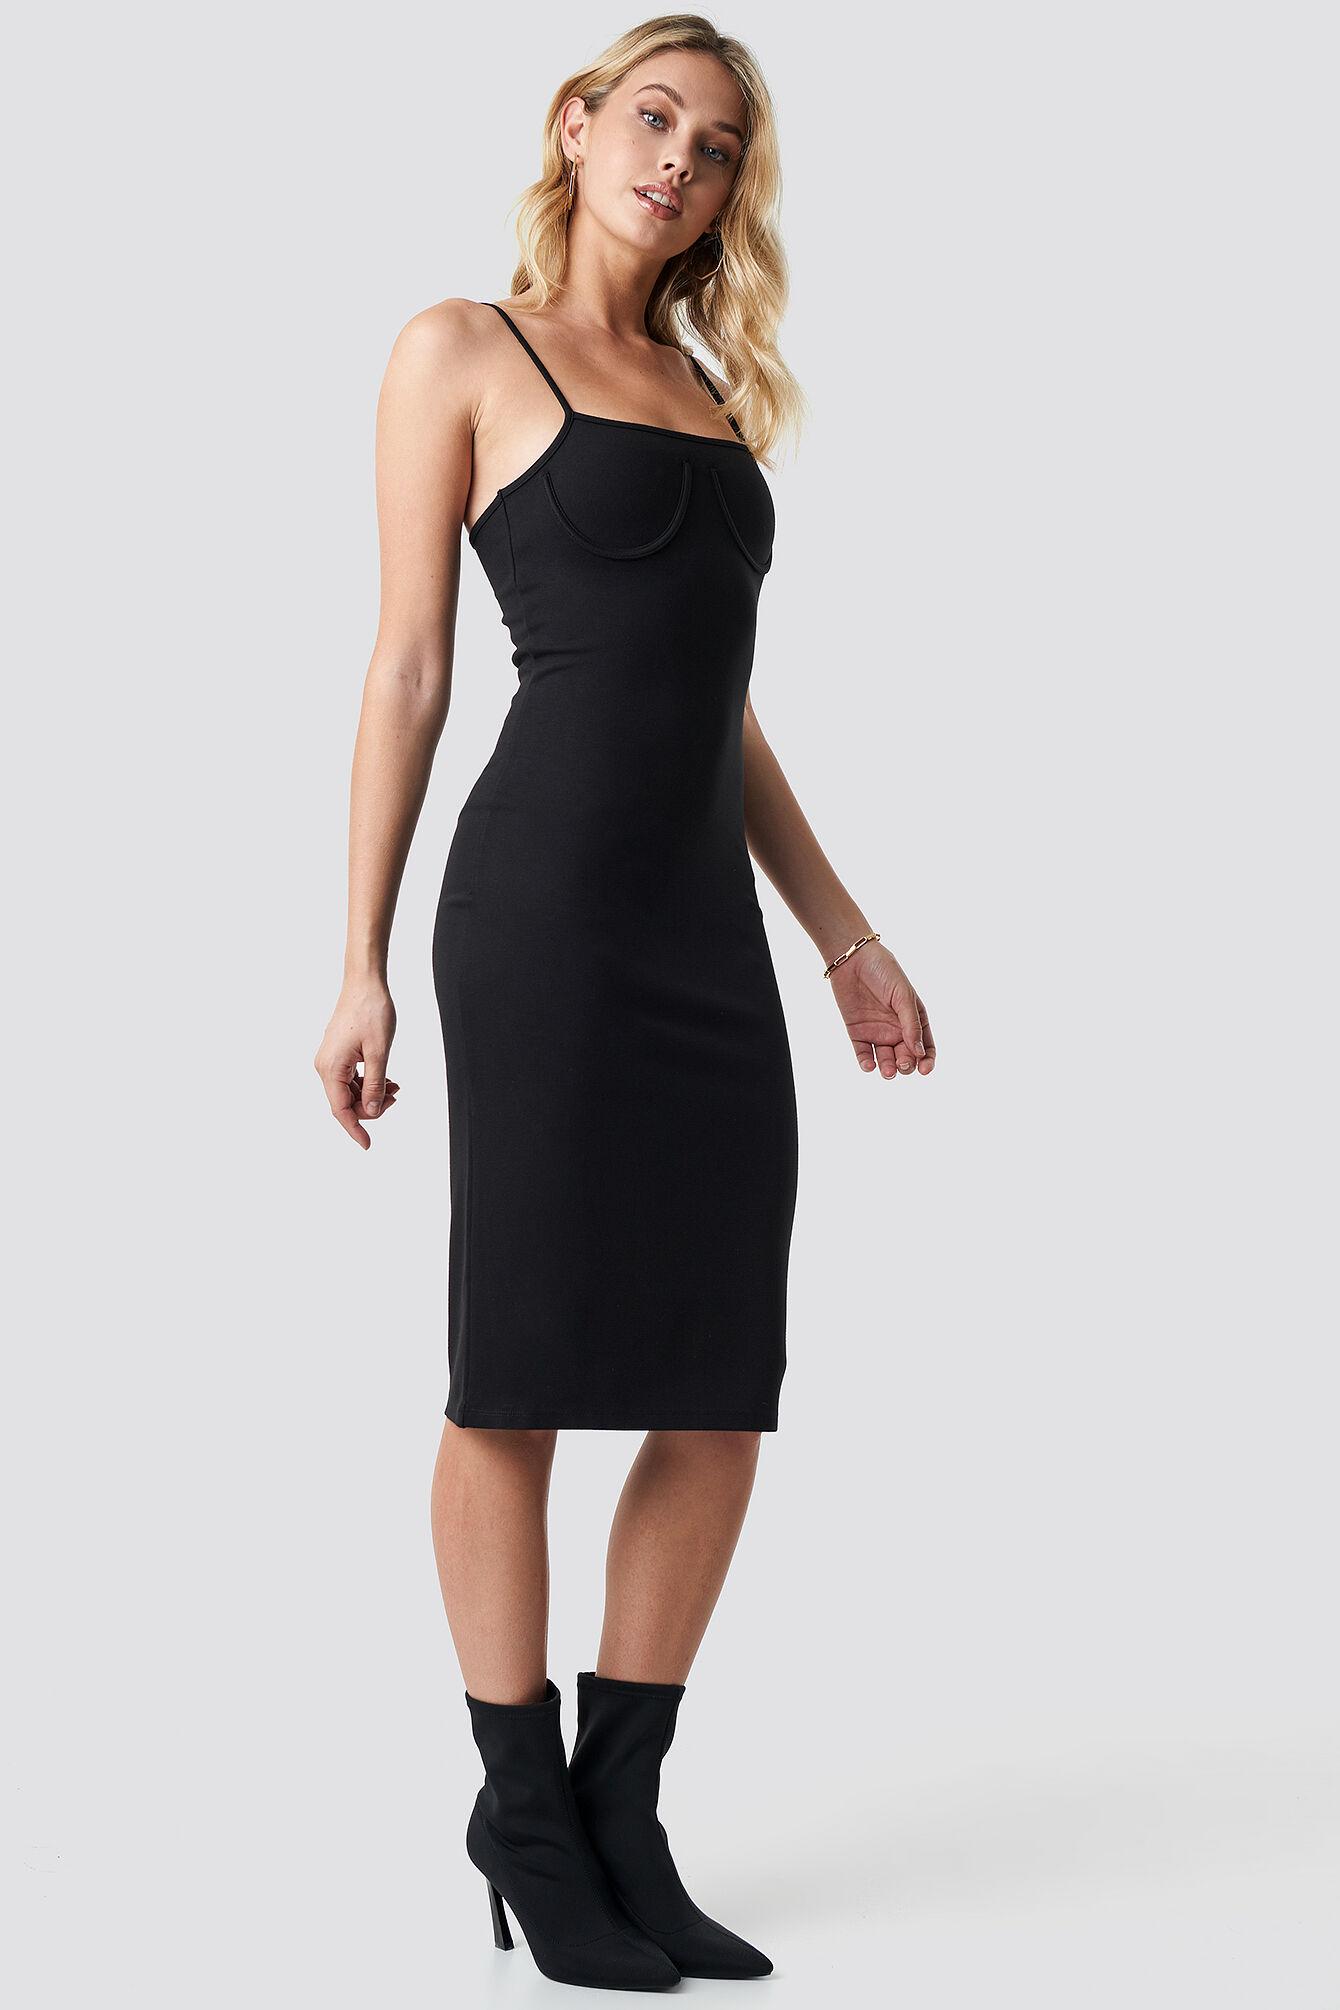 Anna Nooshin x NA-KD Midi Cup Shape Dress - Black